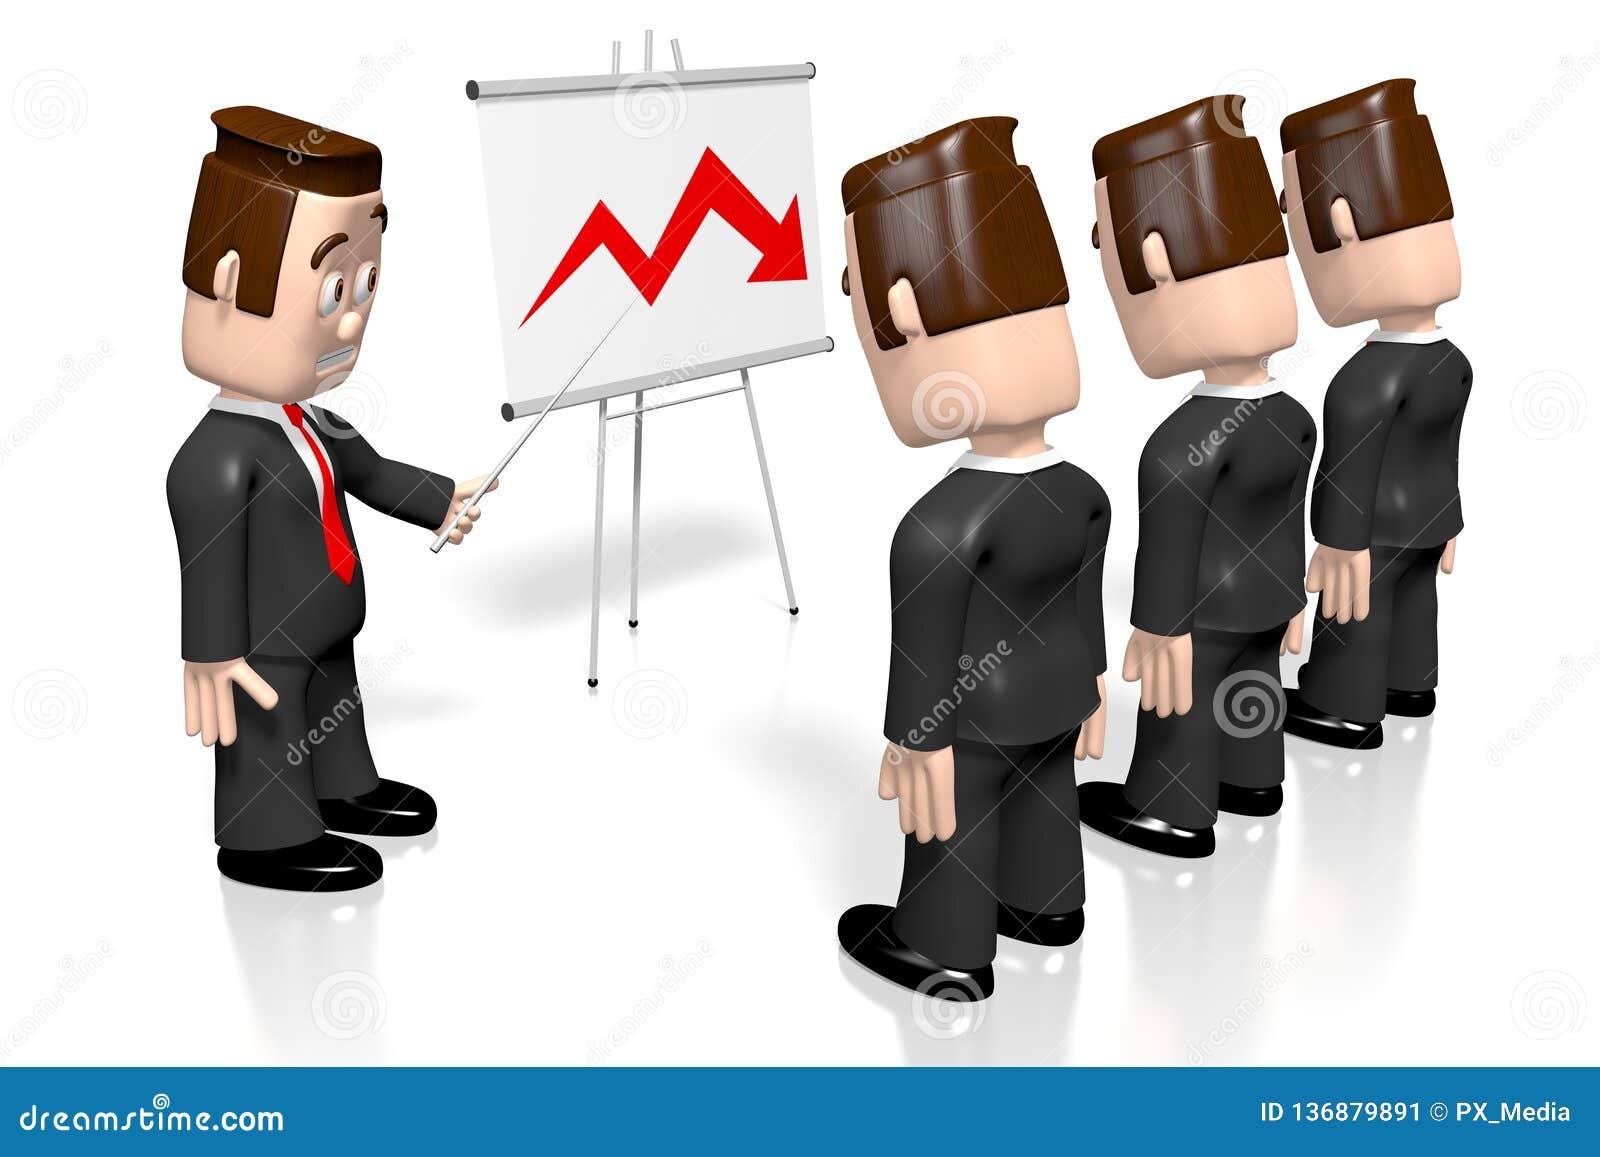 3D businessmen, presentation board - crisis chart